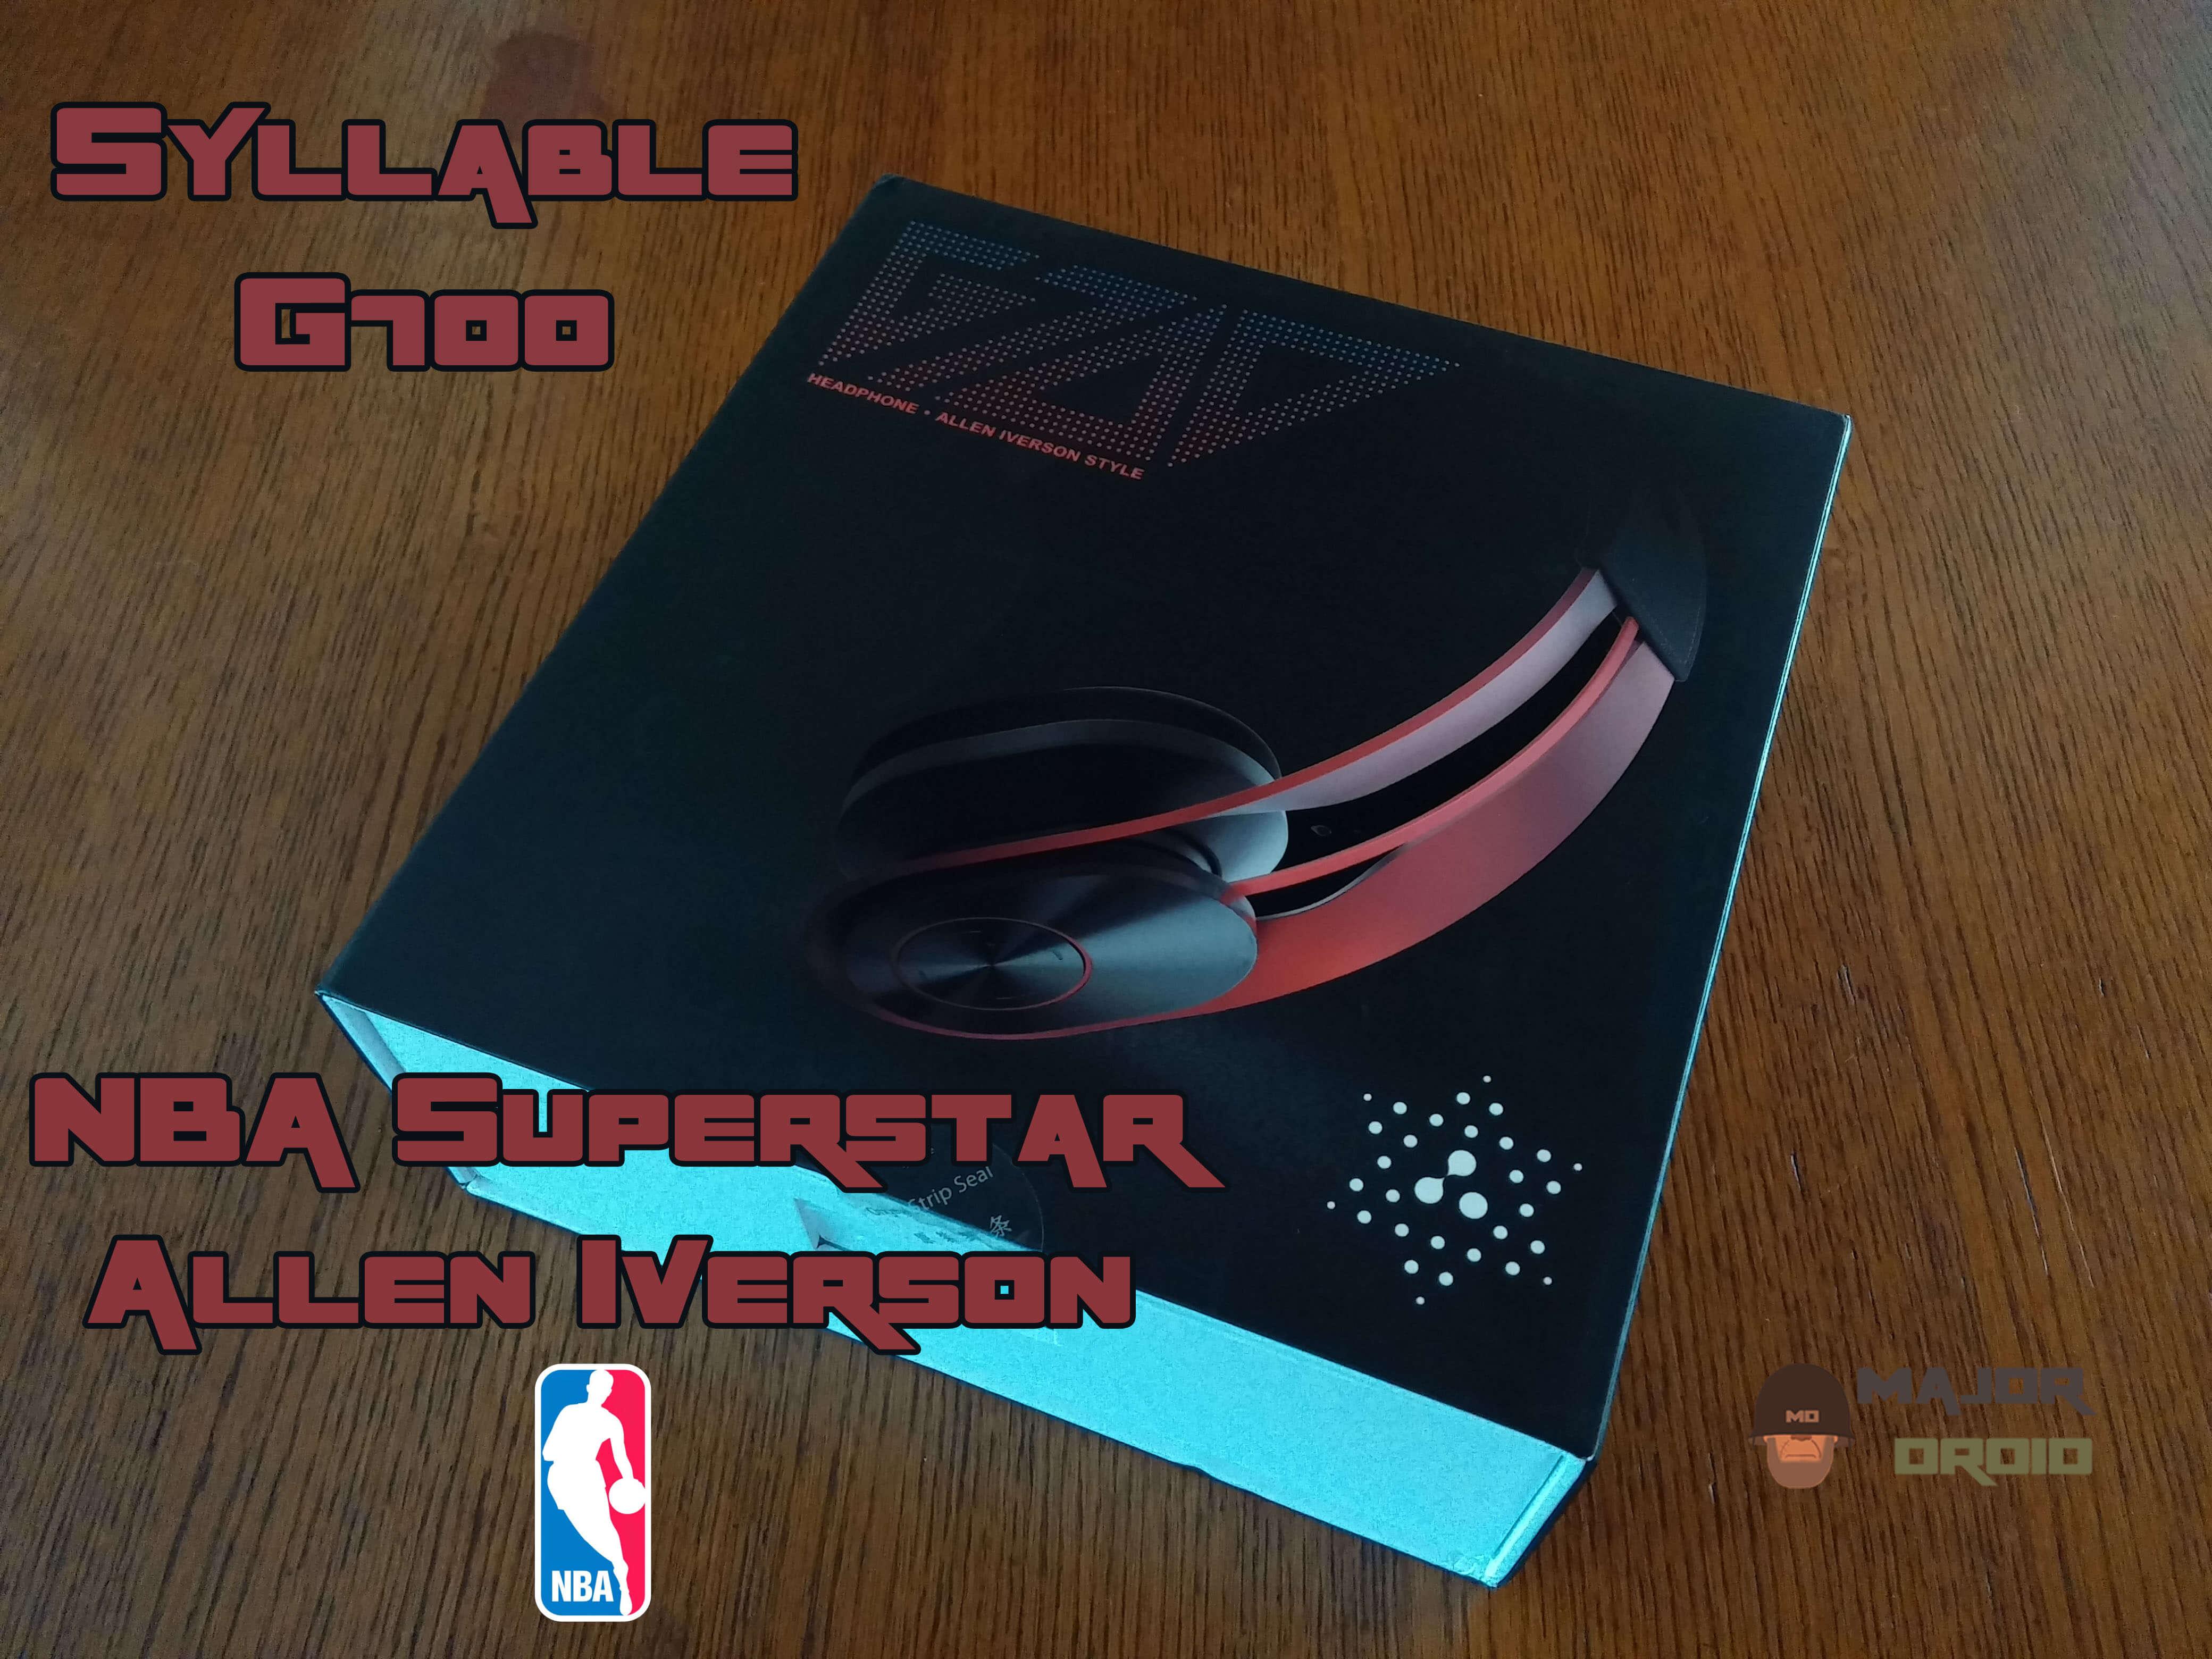 Syllable G700 box